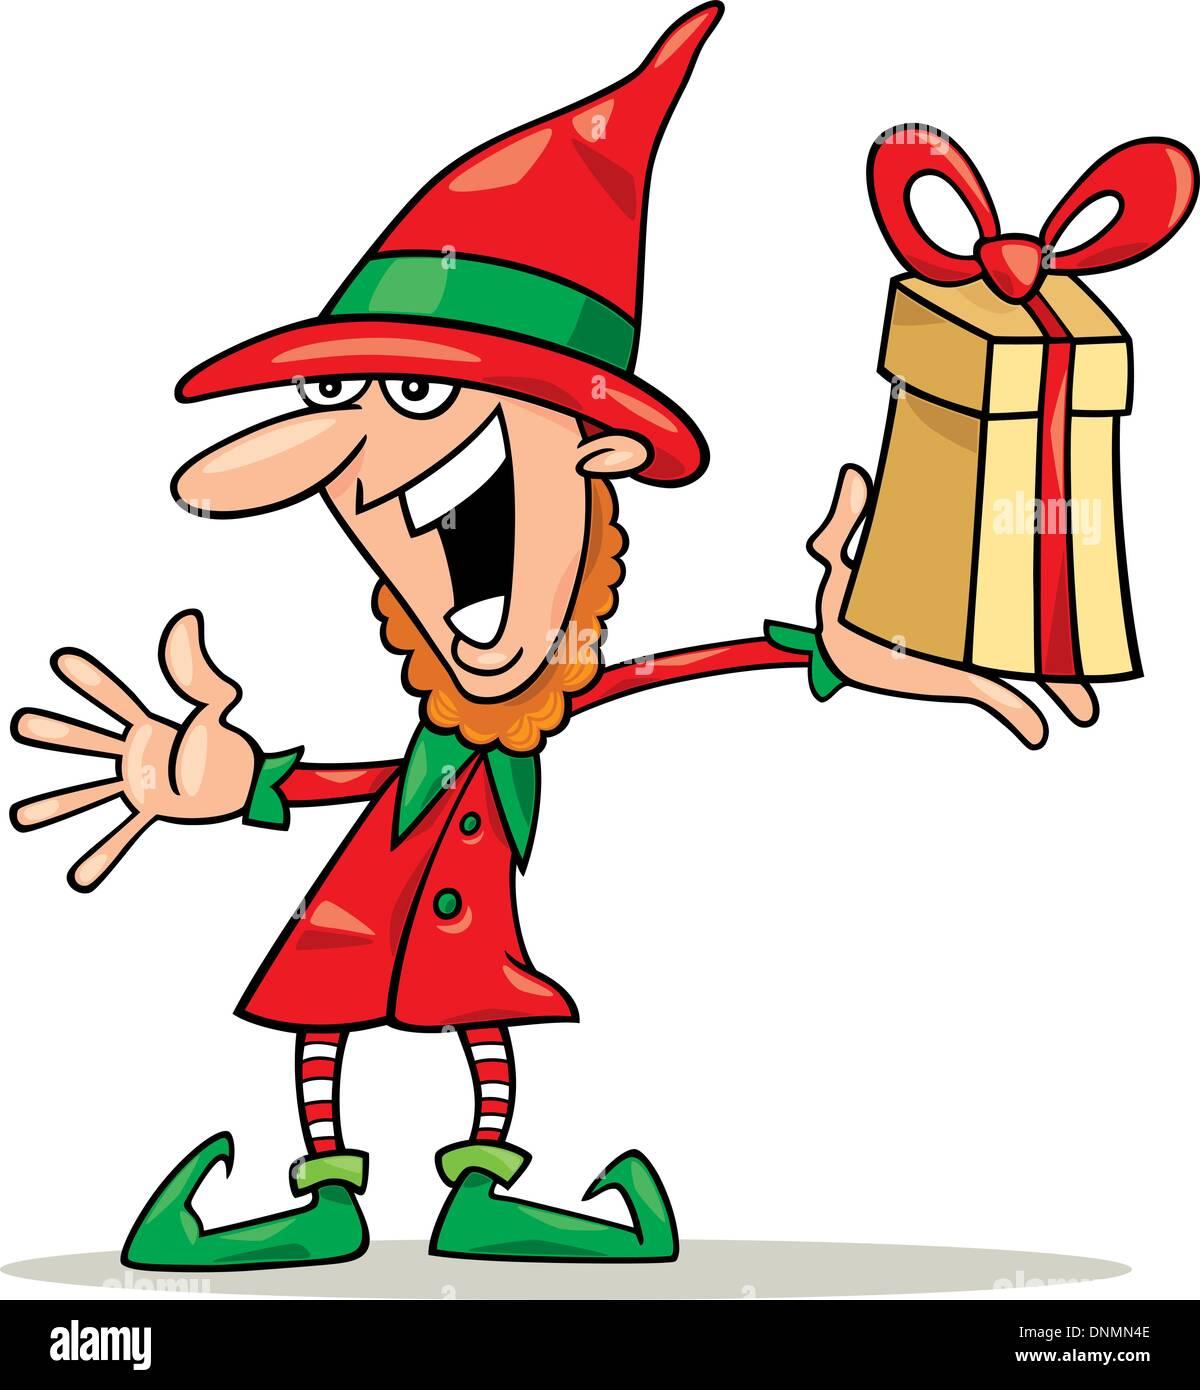 Illustration Christmas Elf Special Gift Stock Photos & Illustration ...